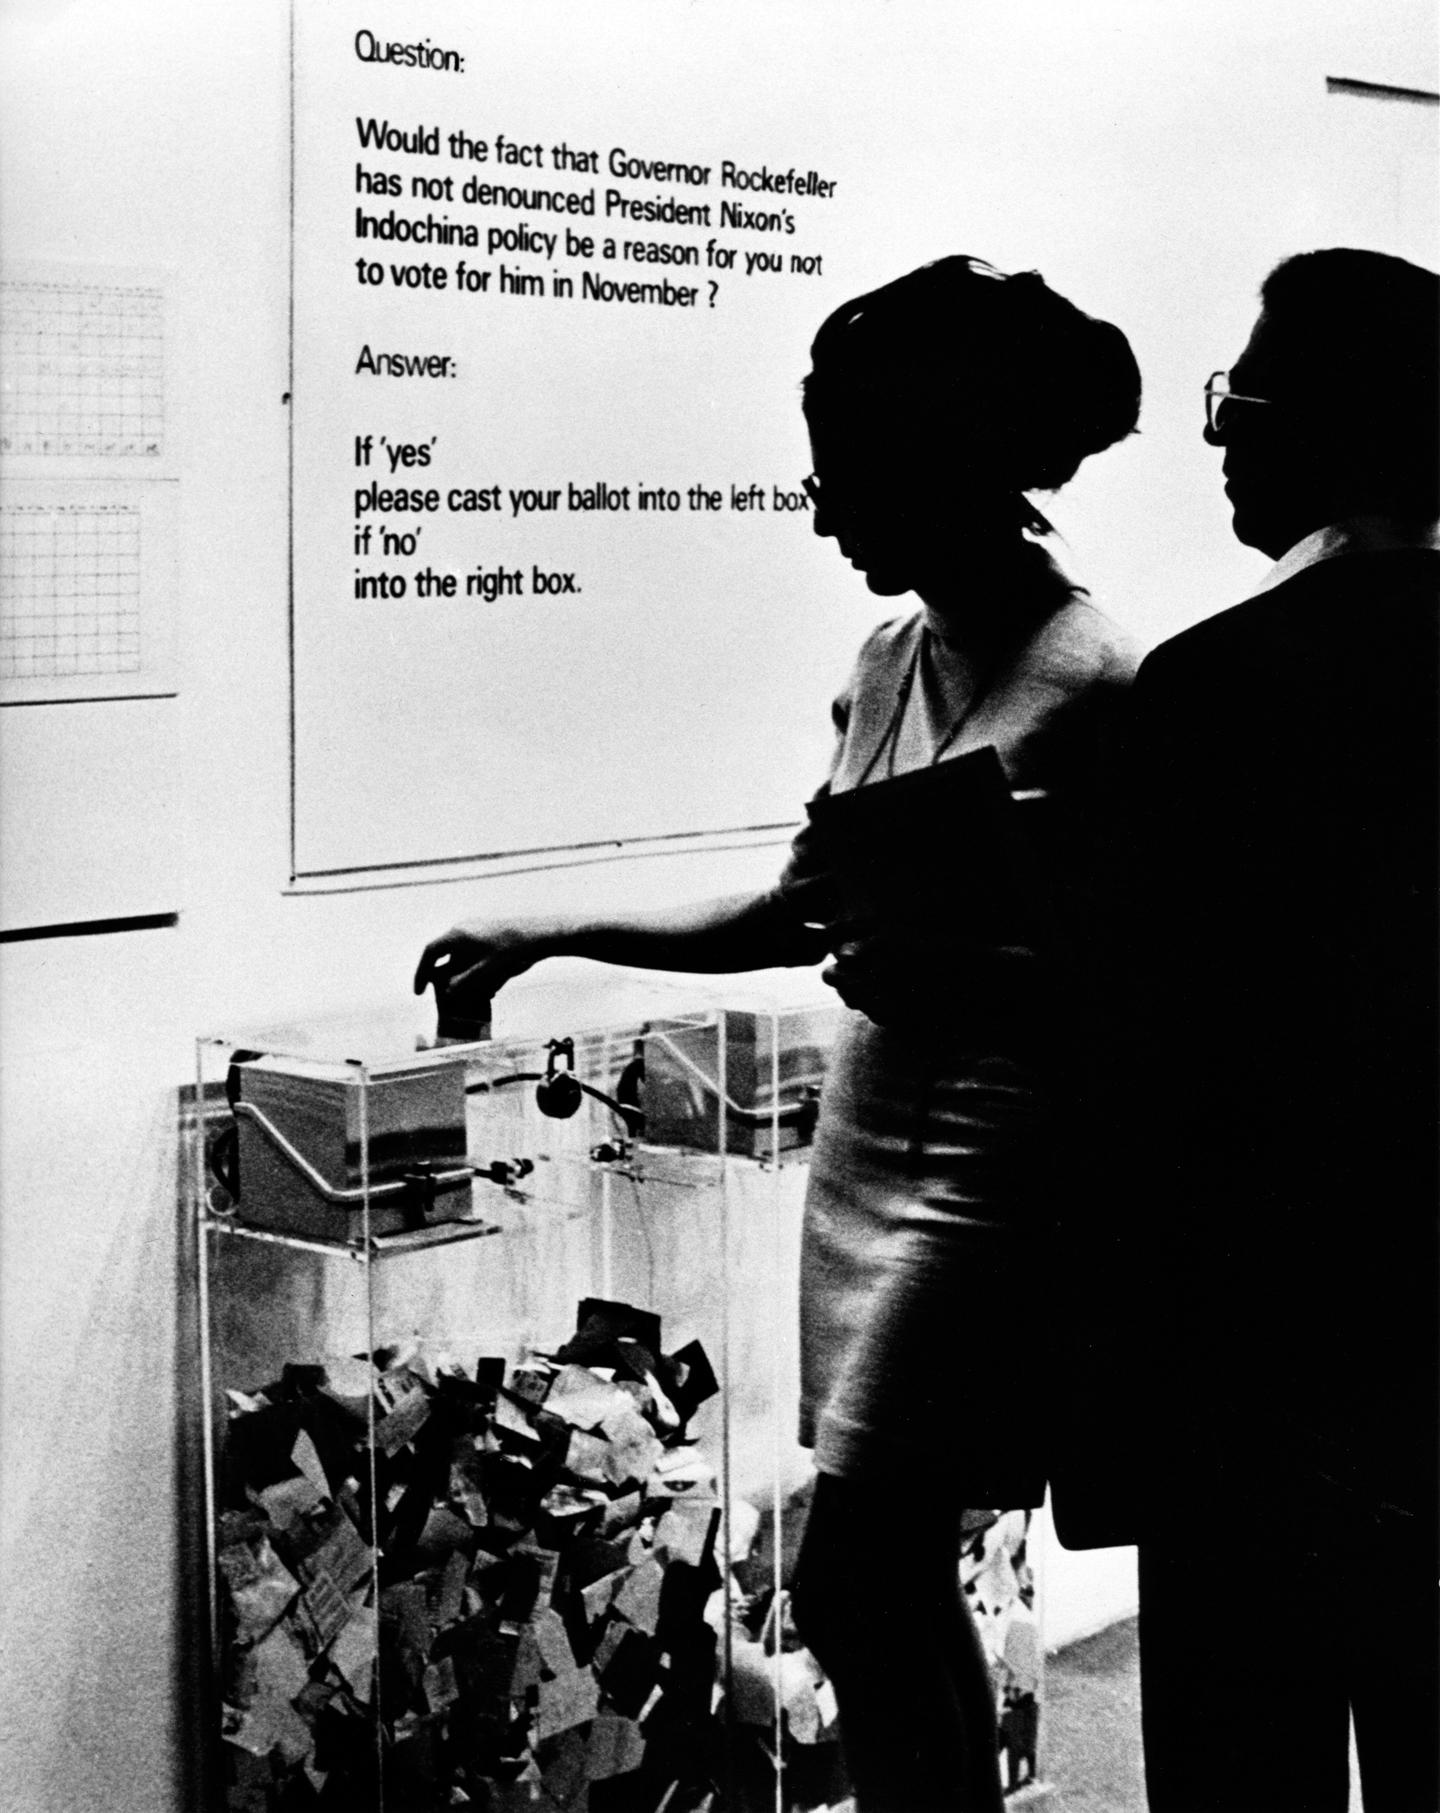 Hans Haacke, MoMA-Poll, 1970. © Hans Haacke / VG Bild-Kunst. Courtesy: Paula Cooper Gallery, New York